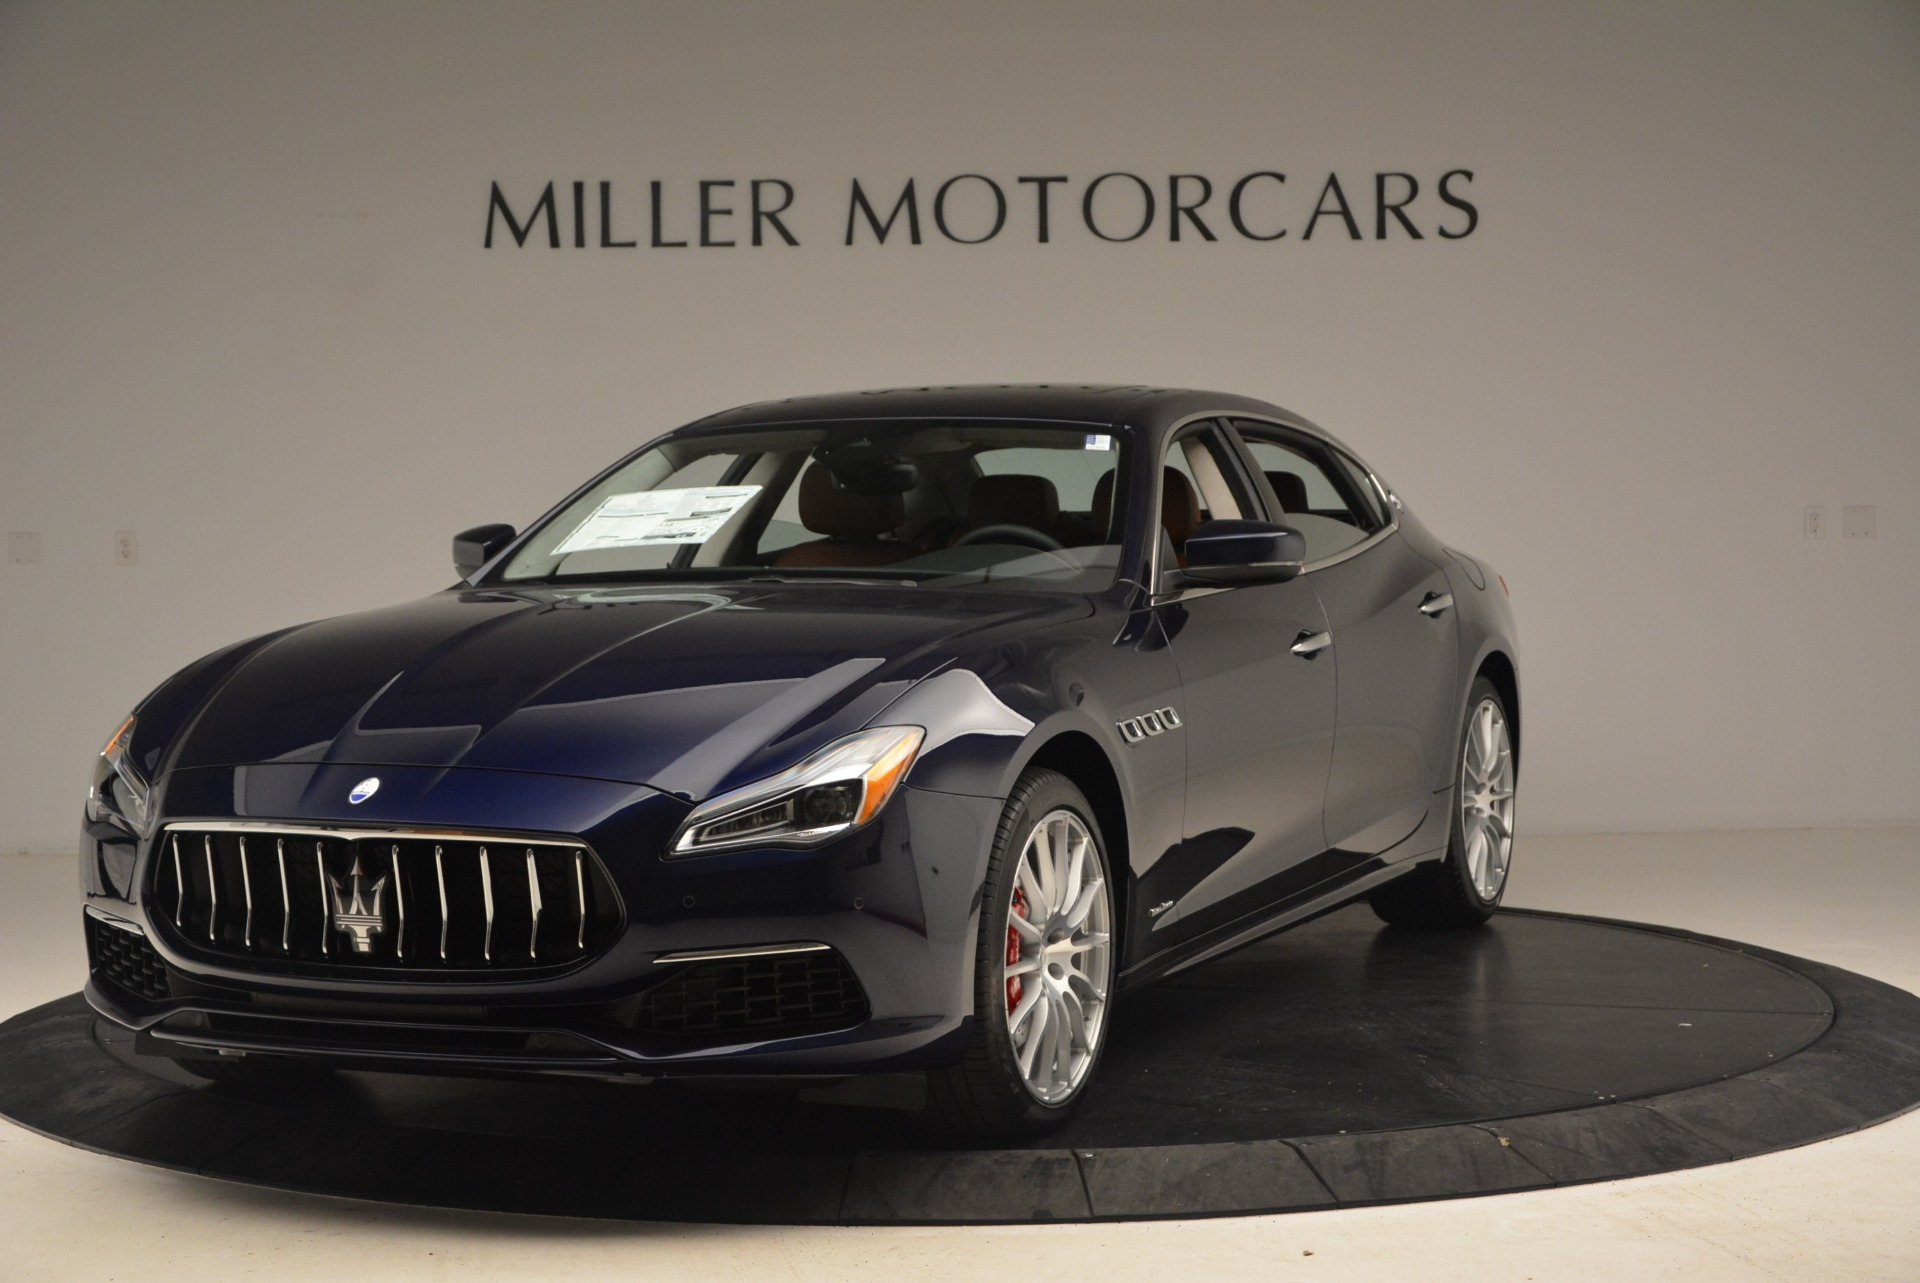 New 2019 Maserati Quattroporte S Q4 GranSport for sale $125,765 at Bentley Greenwich in Greenwich CT 06830 1